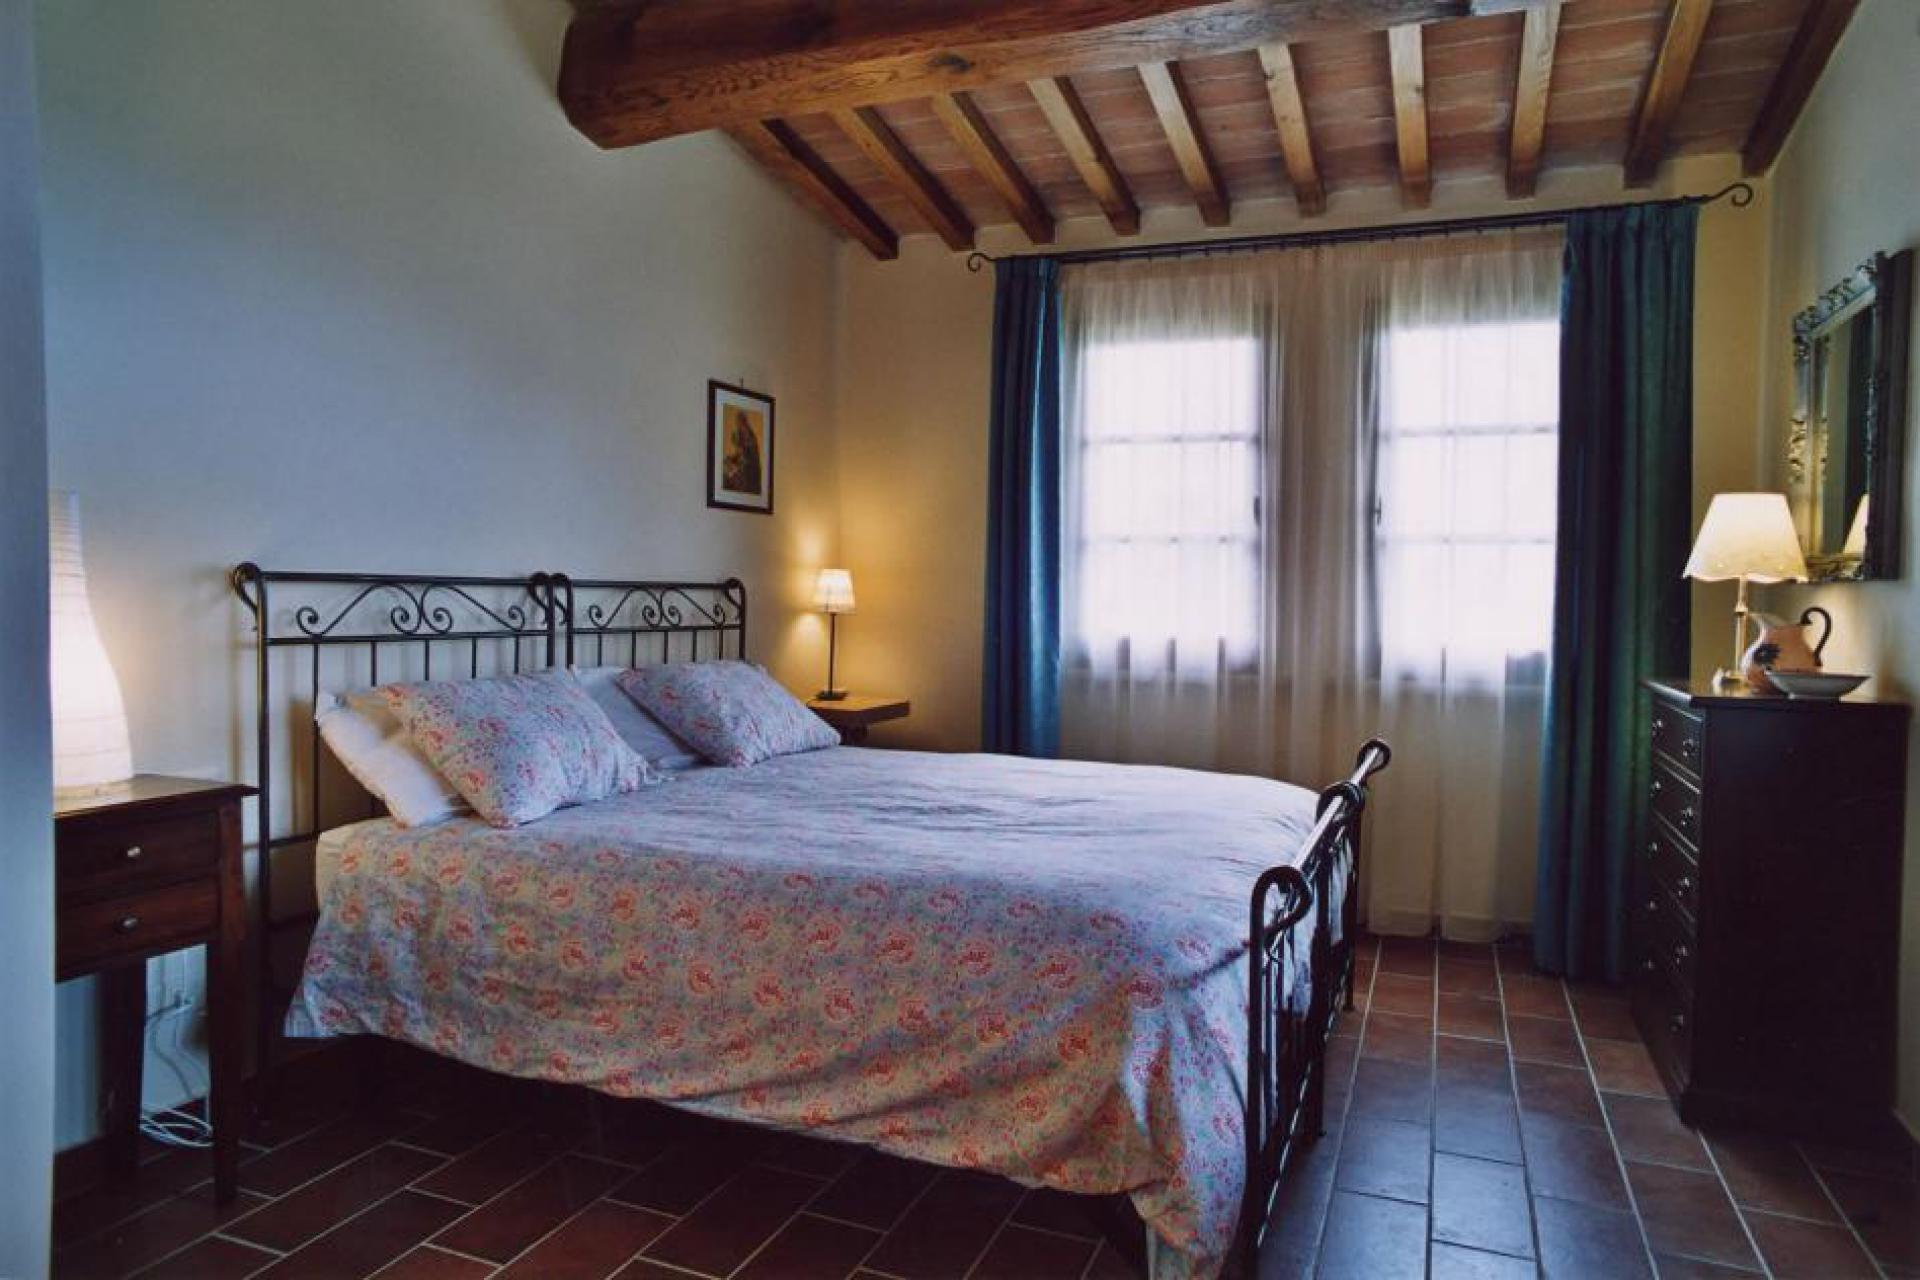 Agriturismo Toscana Agriturismo piccolo e lussuoso vicino Volterra, Toscana